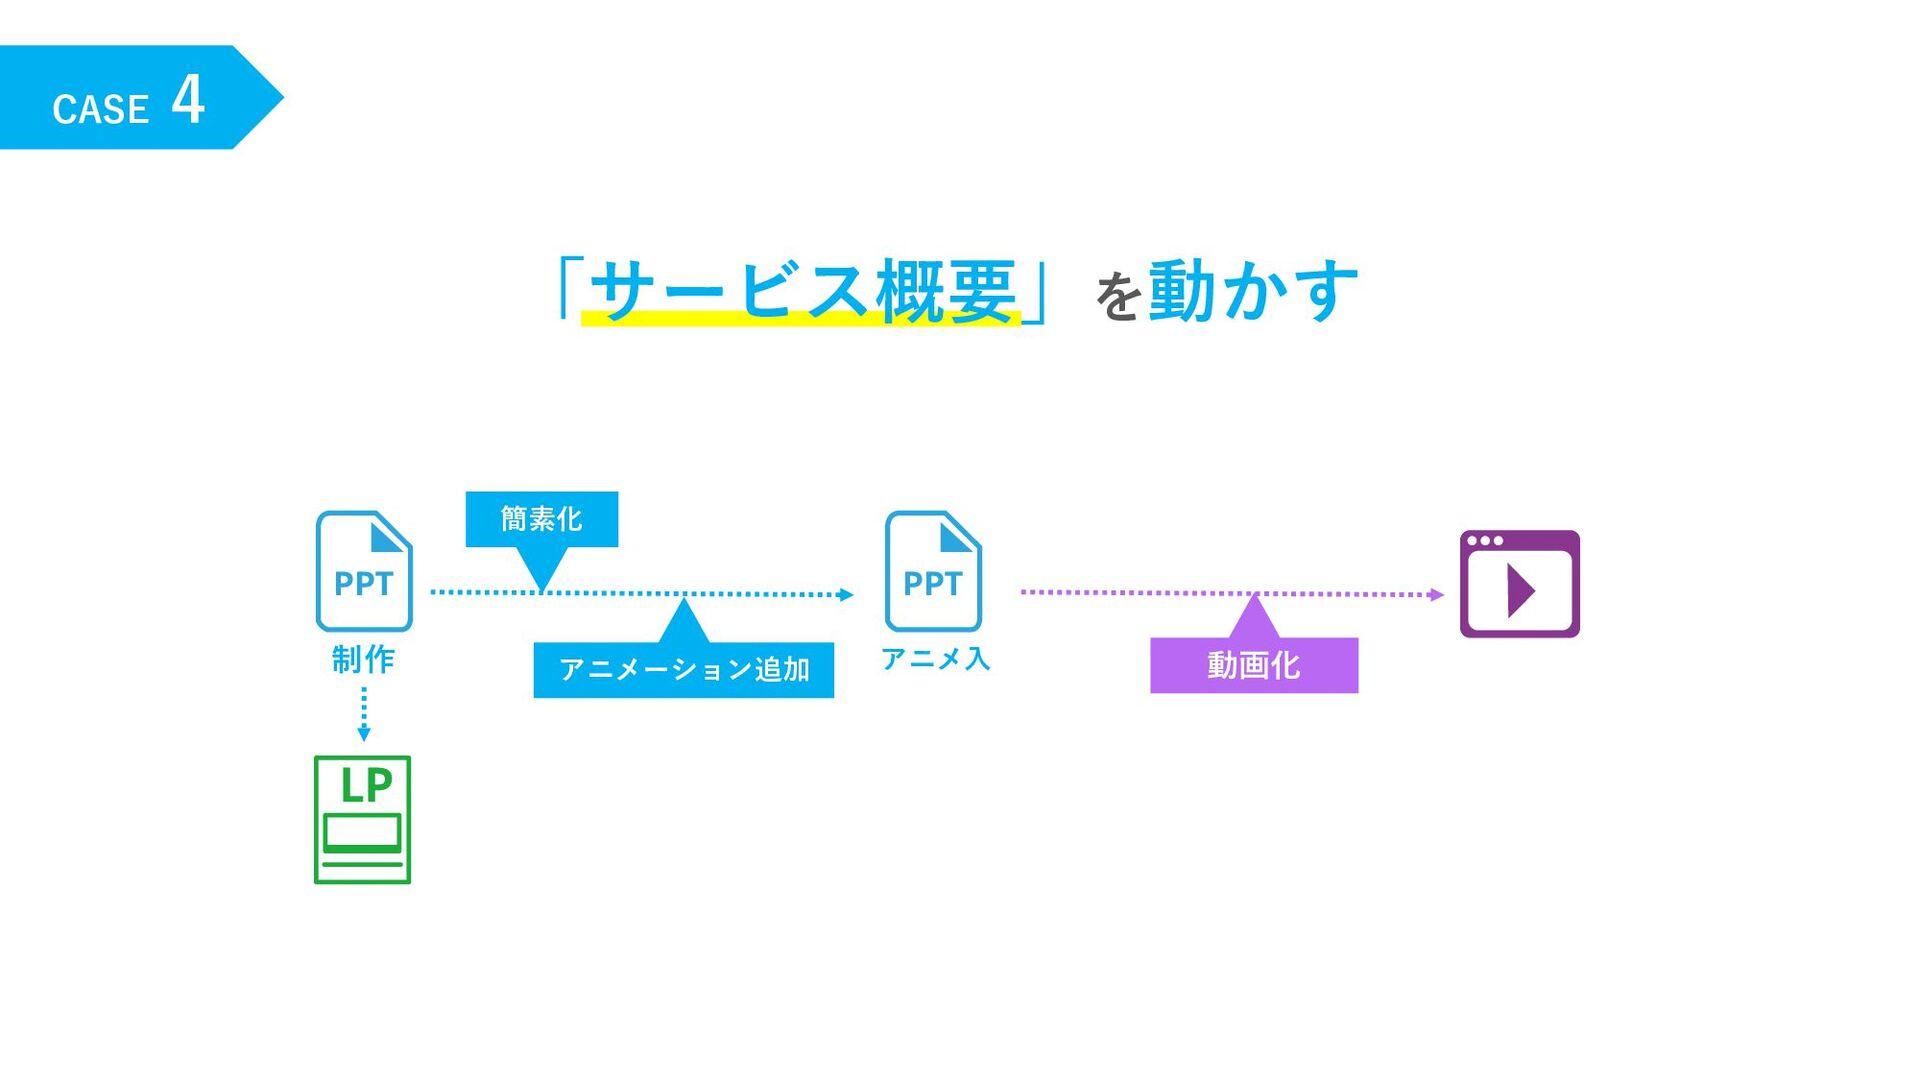 CASE 4 「サービス概要」を動かす 制作 動画化 アニメーション追加 簡素化 アニメ⼊